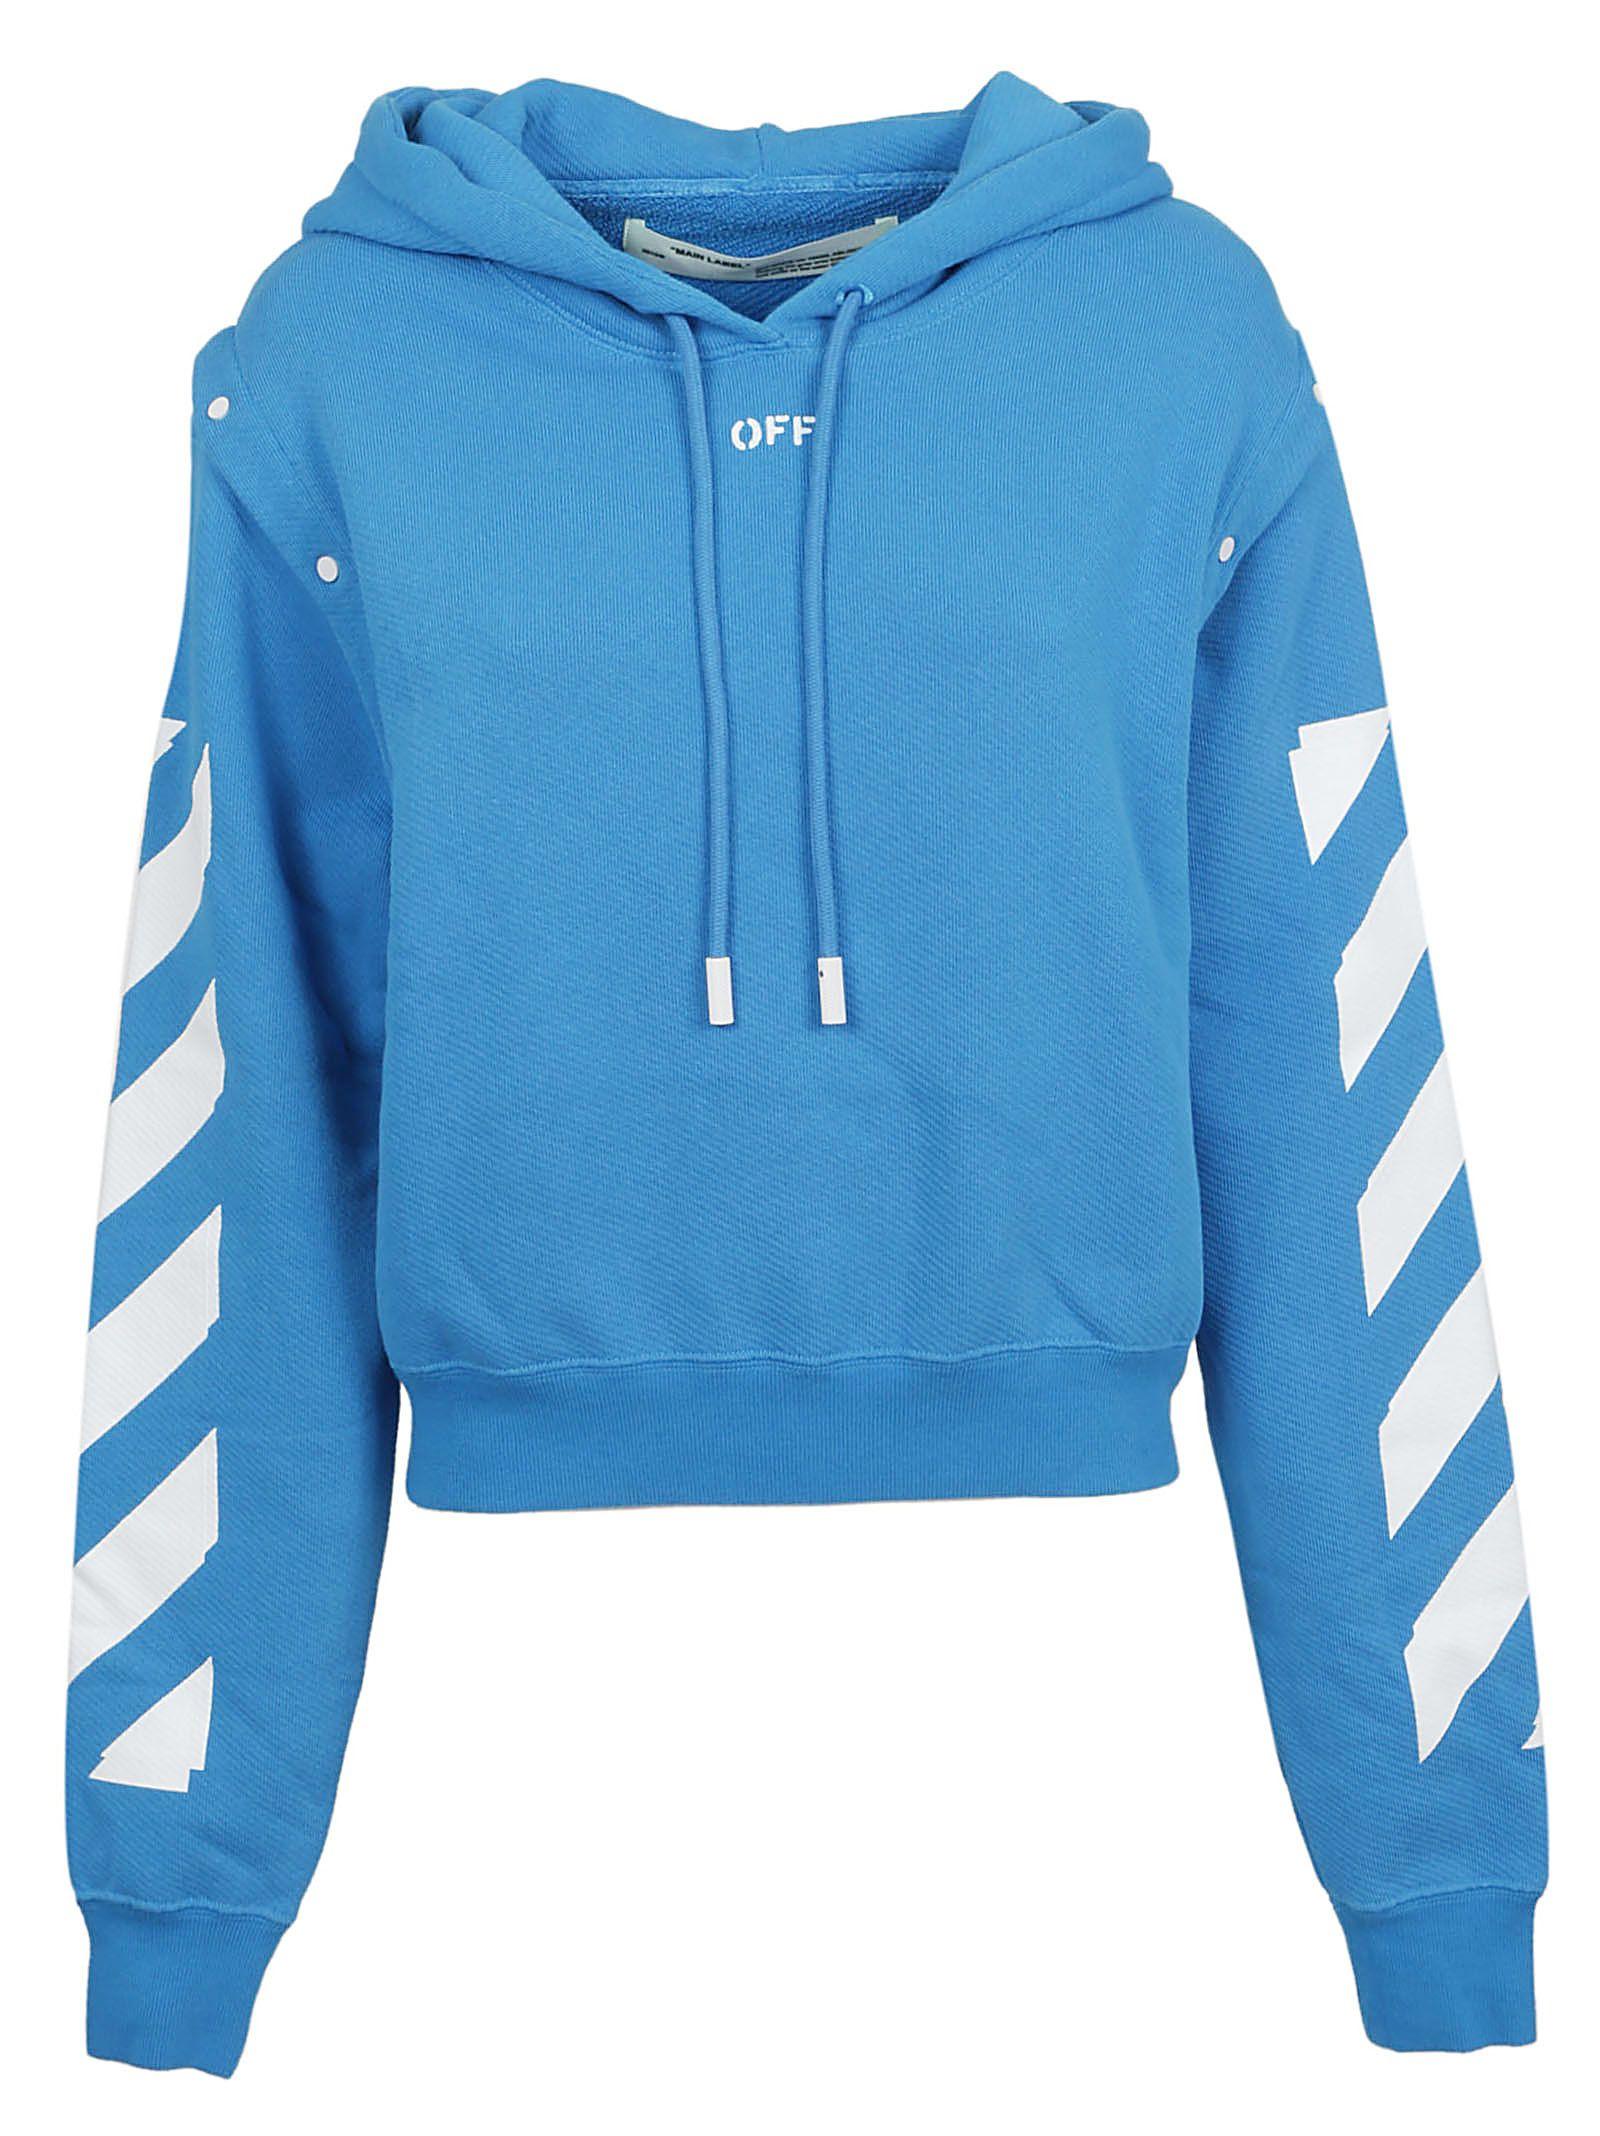 Off-White Off-white Diagonal Stripe Hoodie - Blue Whitw - 10830661 ... 7713d1b1c